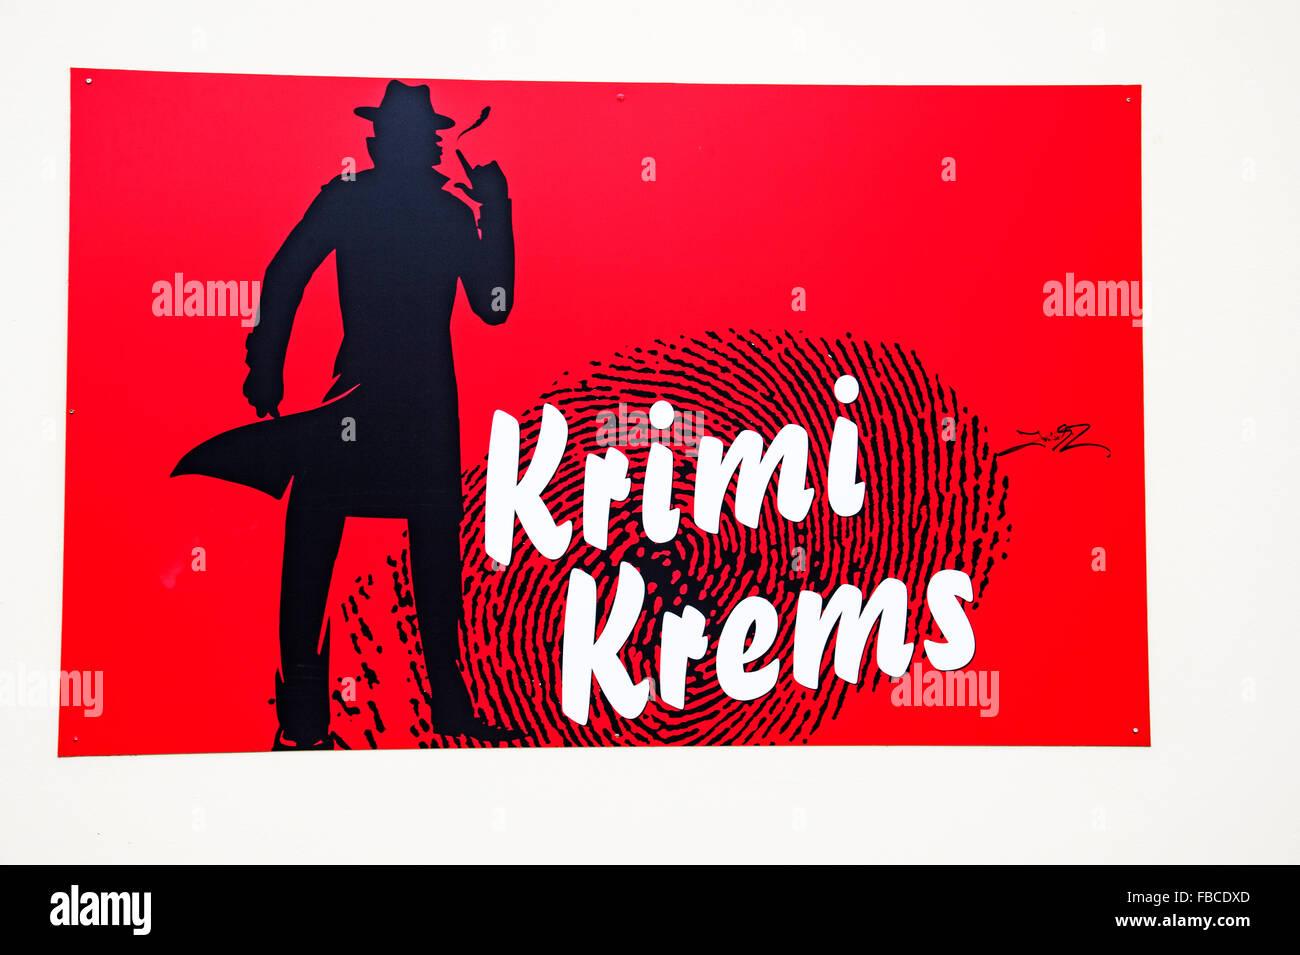 En Krems, Karikaturmuseum Wachau, Niederösterreich; museo de la caricatura, Krems, Wachau Austria Foto de stock